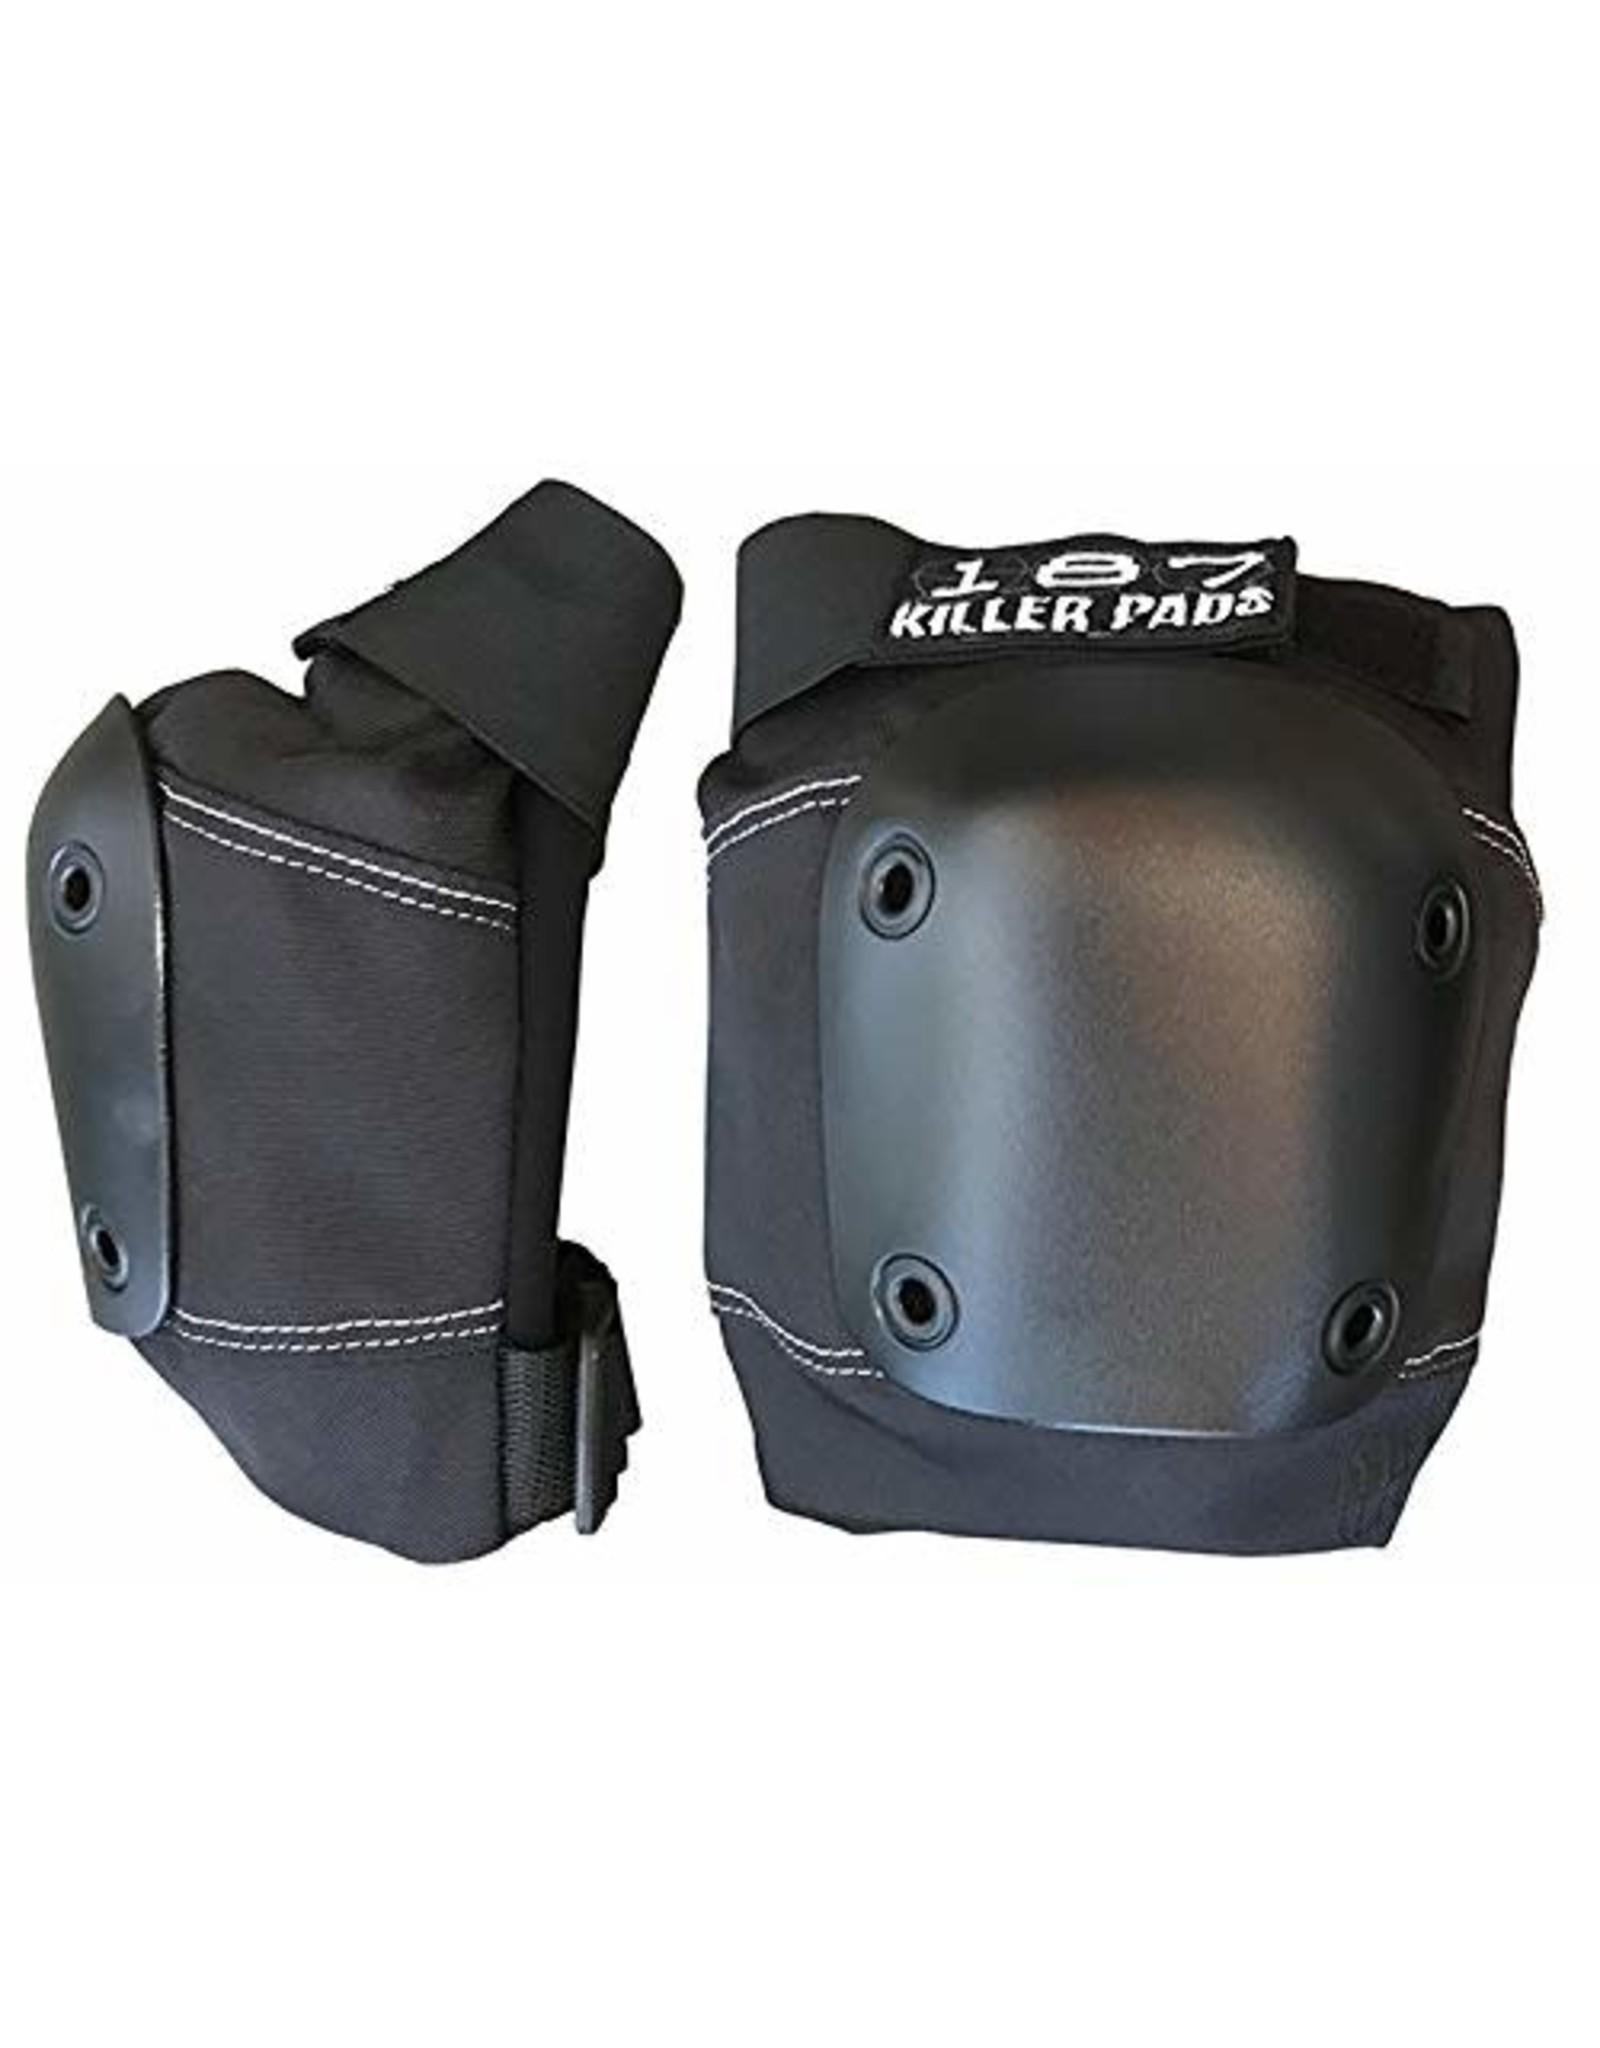 187 killer pads Protection pour genoux 187 killer pads